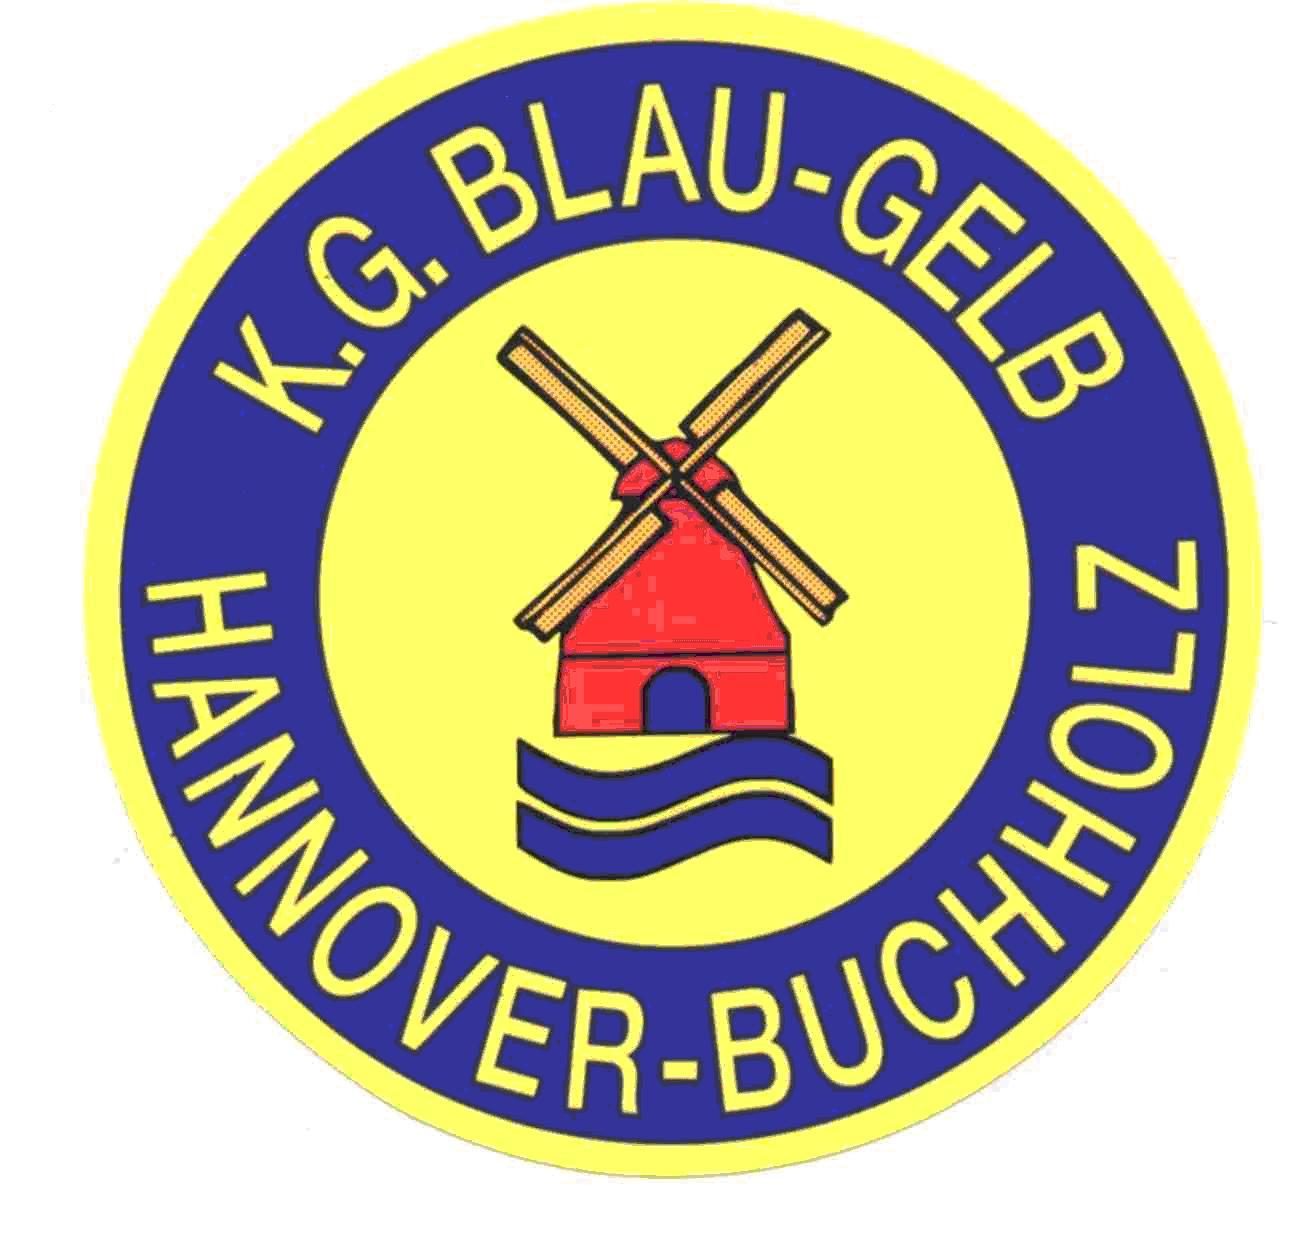 kgblaugelb